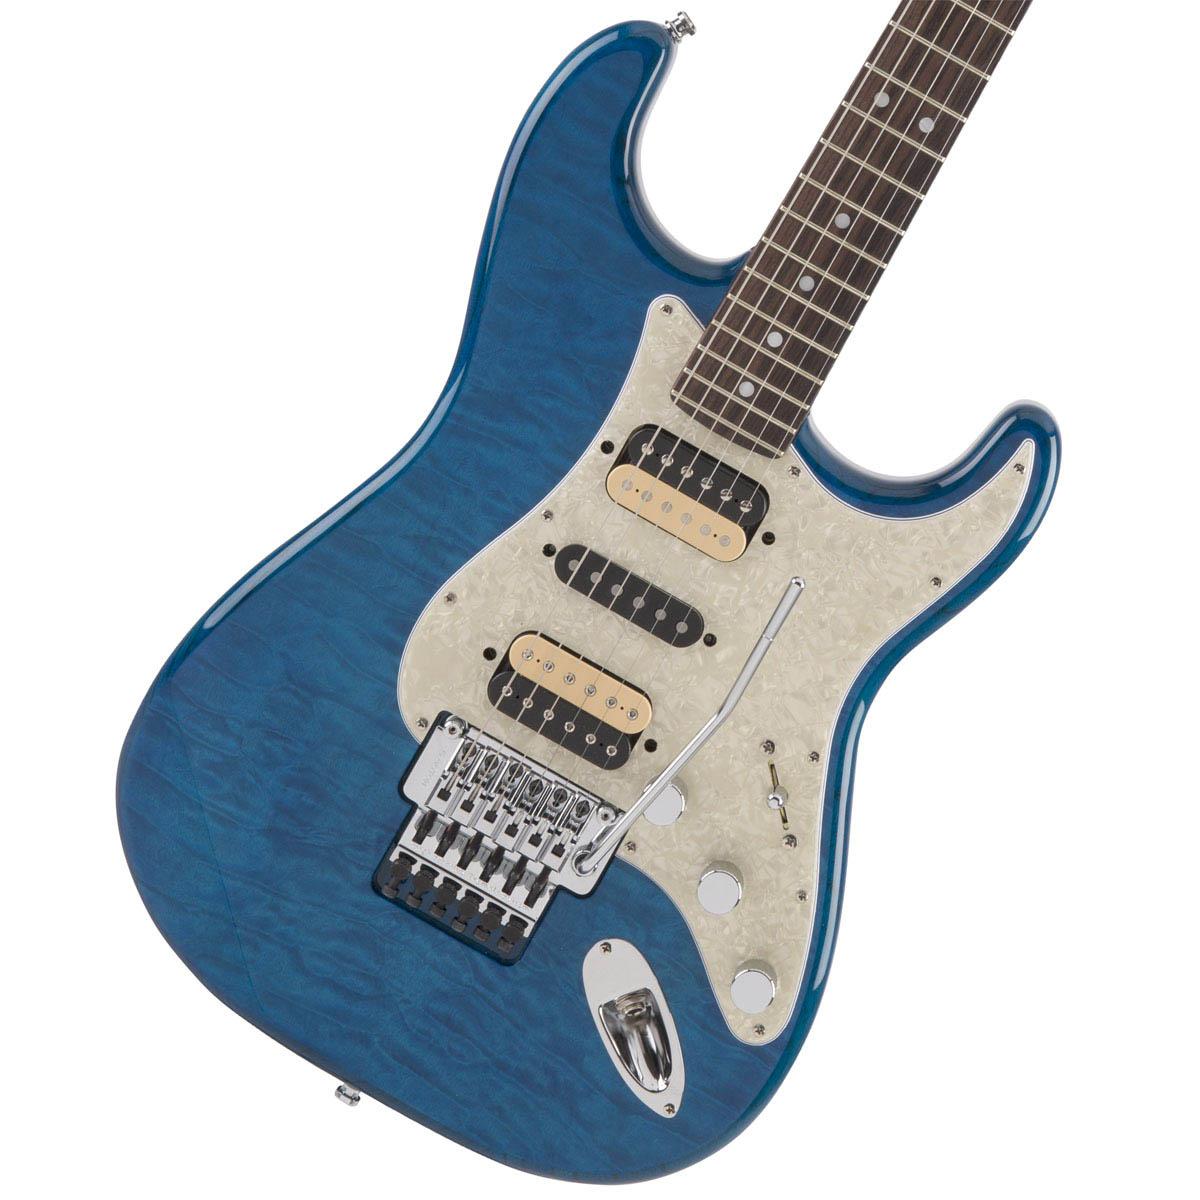 Guitars & Basses Vintage Sunburst From Japan Acoustic Guitars Gibson Memphis 64 Es-330 Td V.o.s